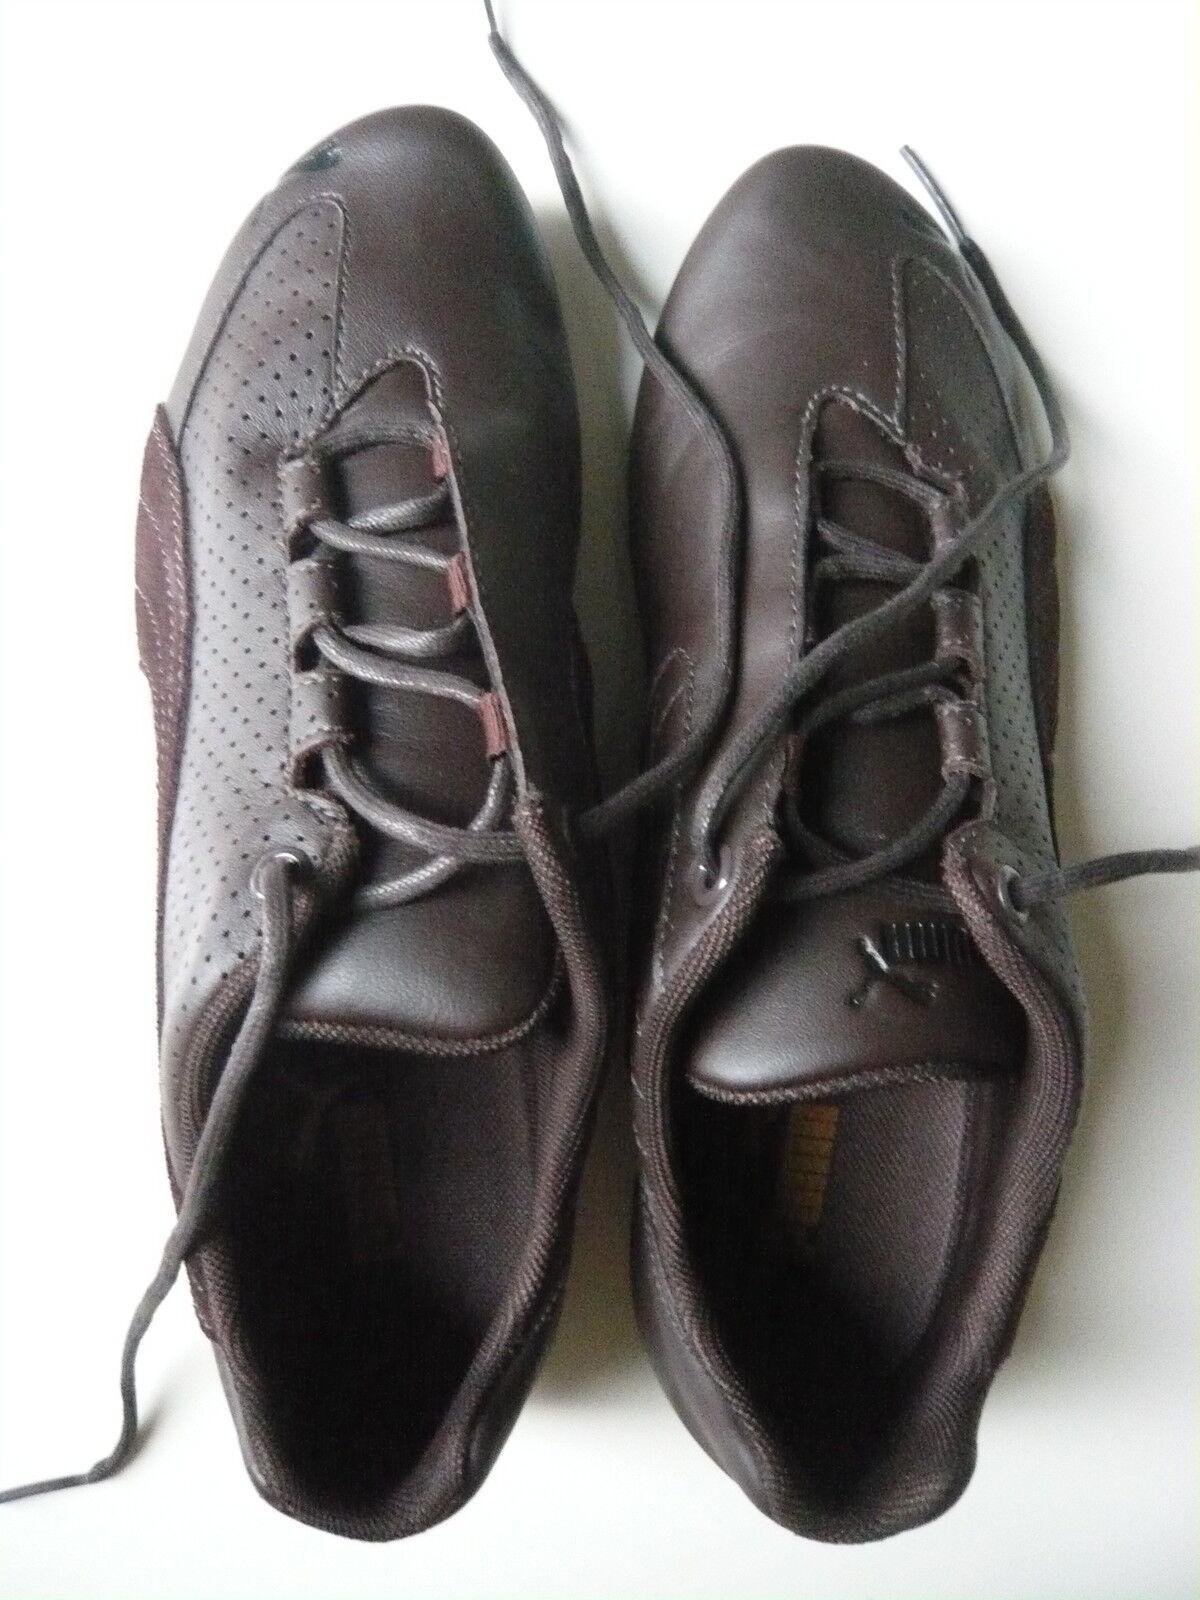 Puma Ferradura L Sneakers Leder braun Gr. Gr. Gr. 39 Schuhe Sportschuhe Freizeitschuhe 527905